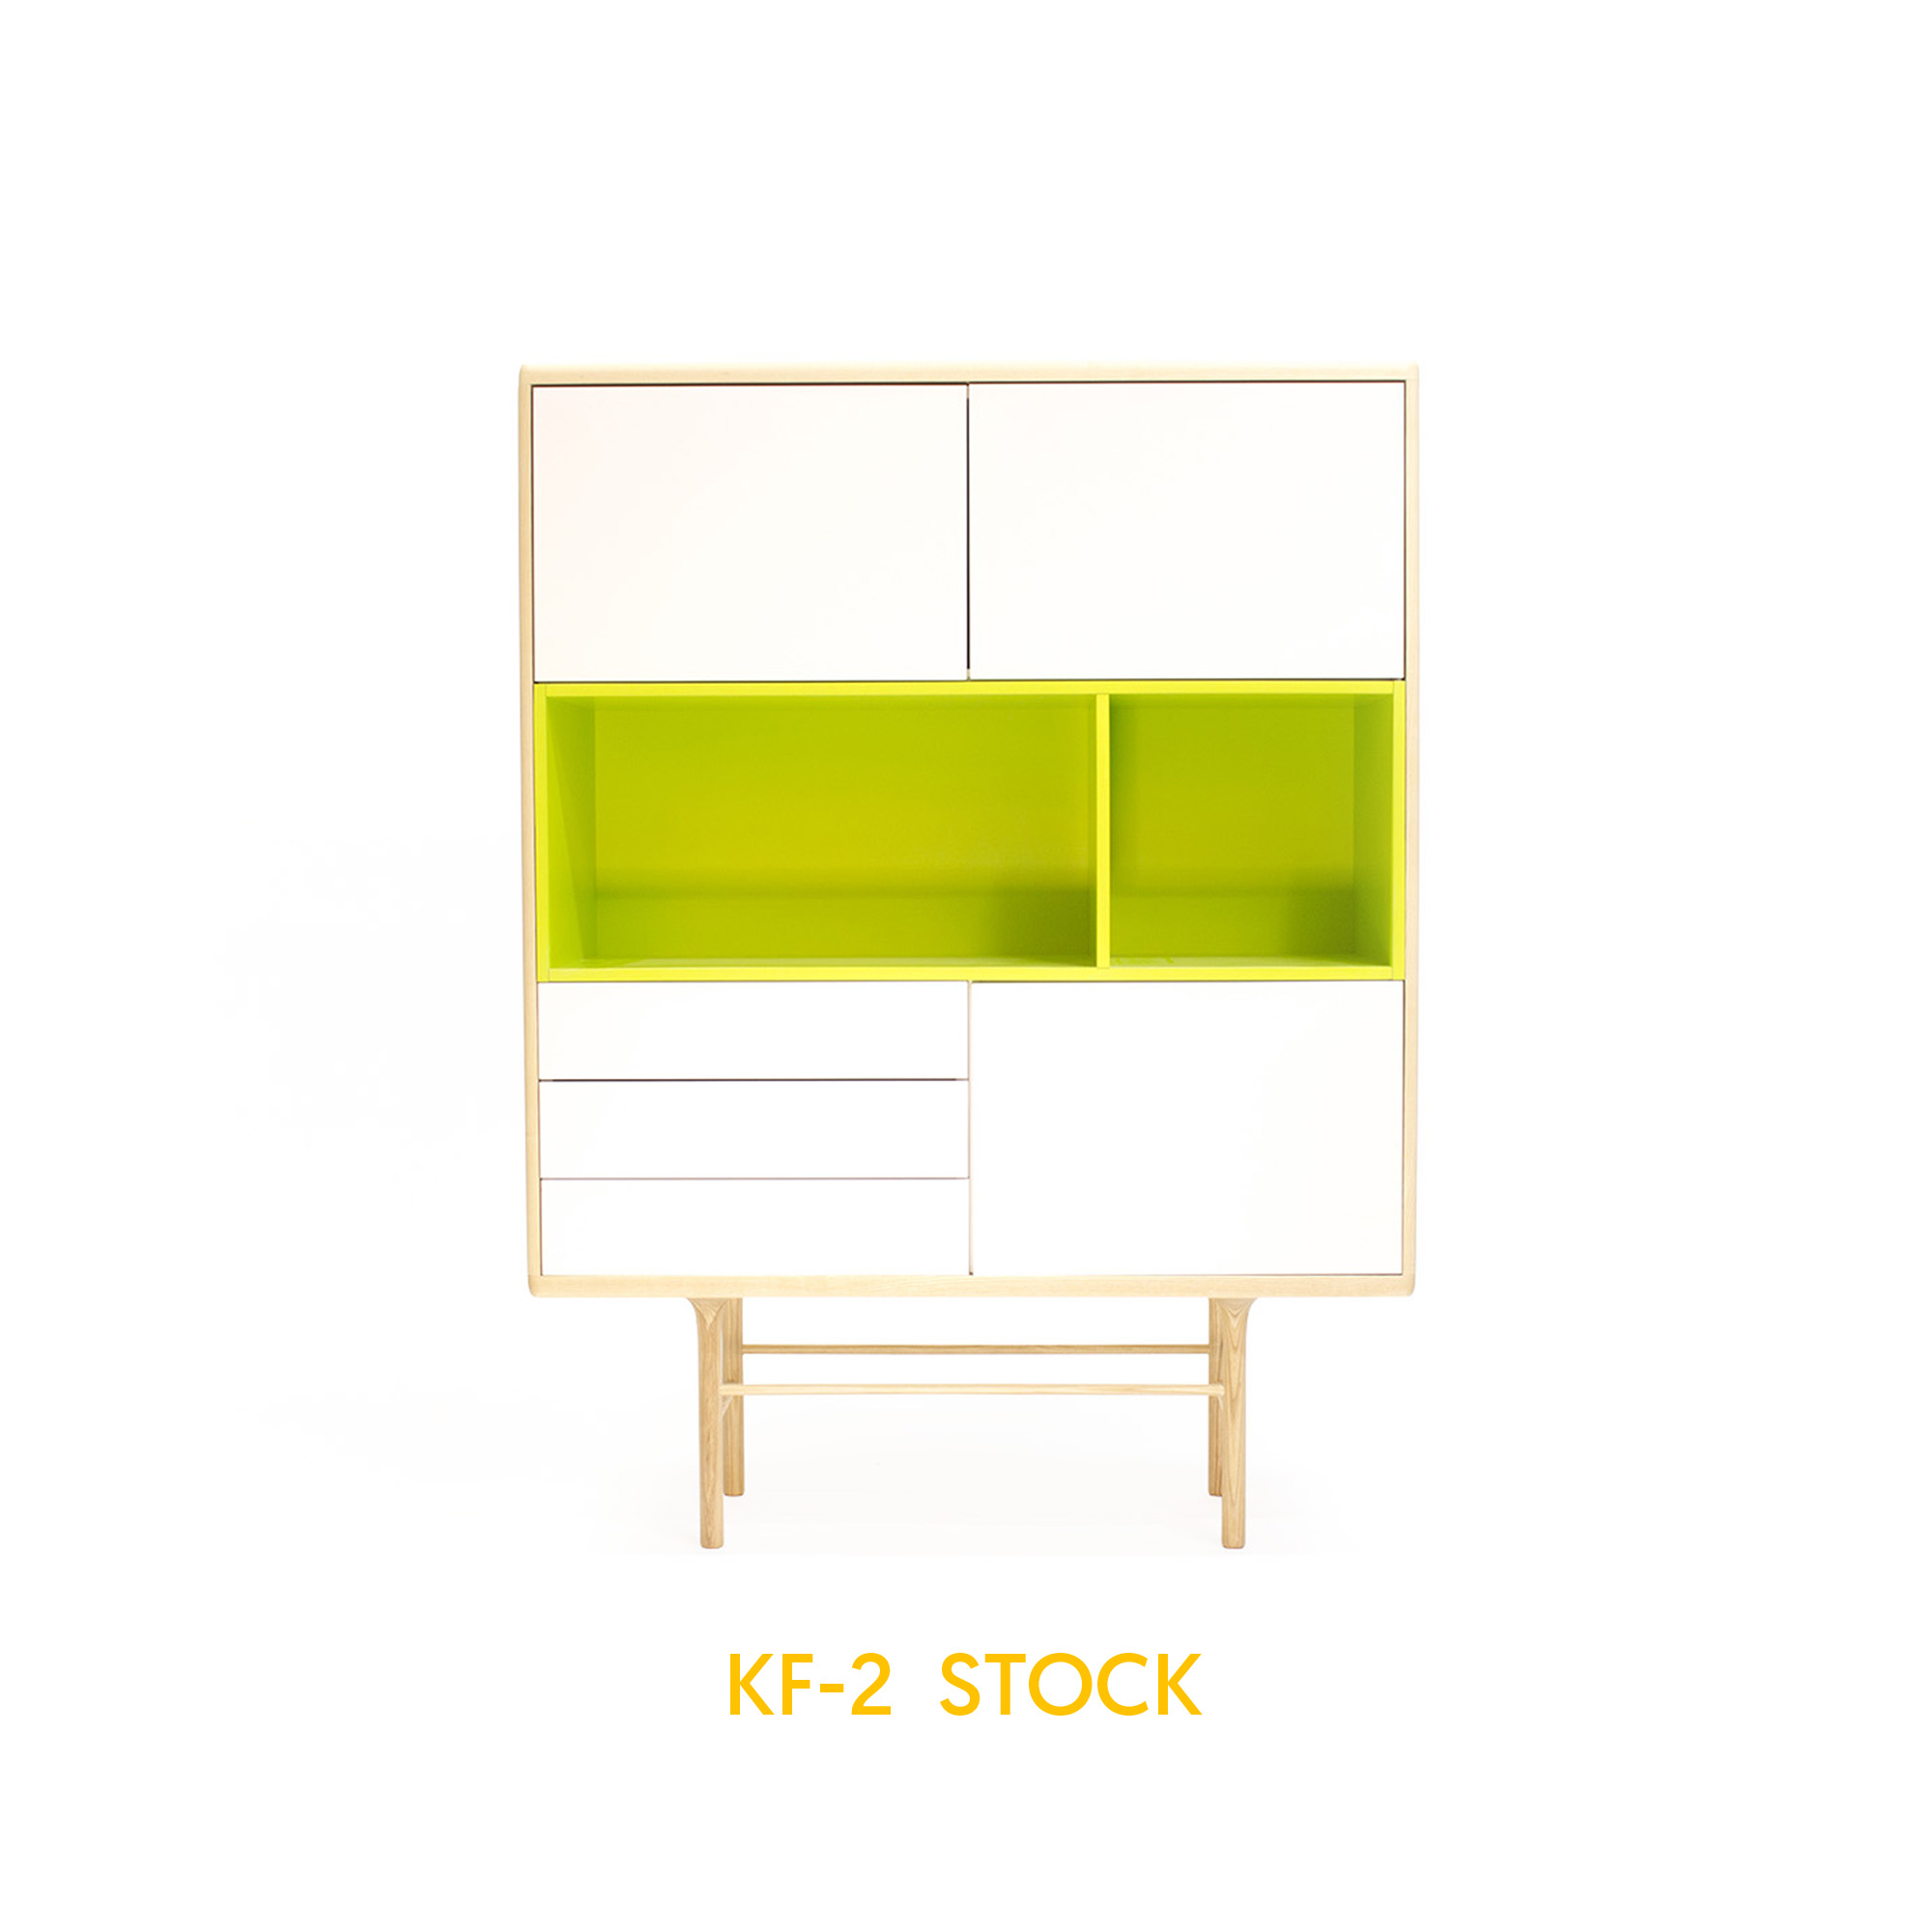 KF-2 STOCK.jpg